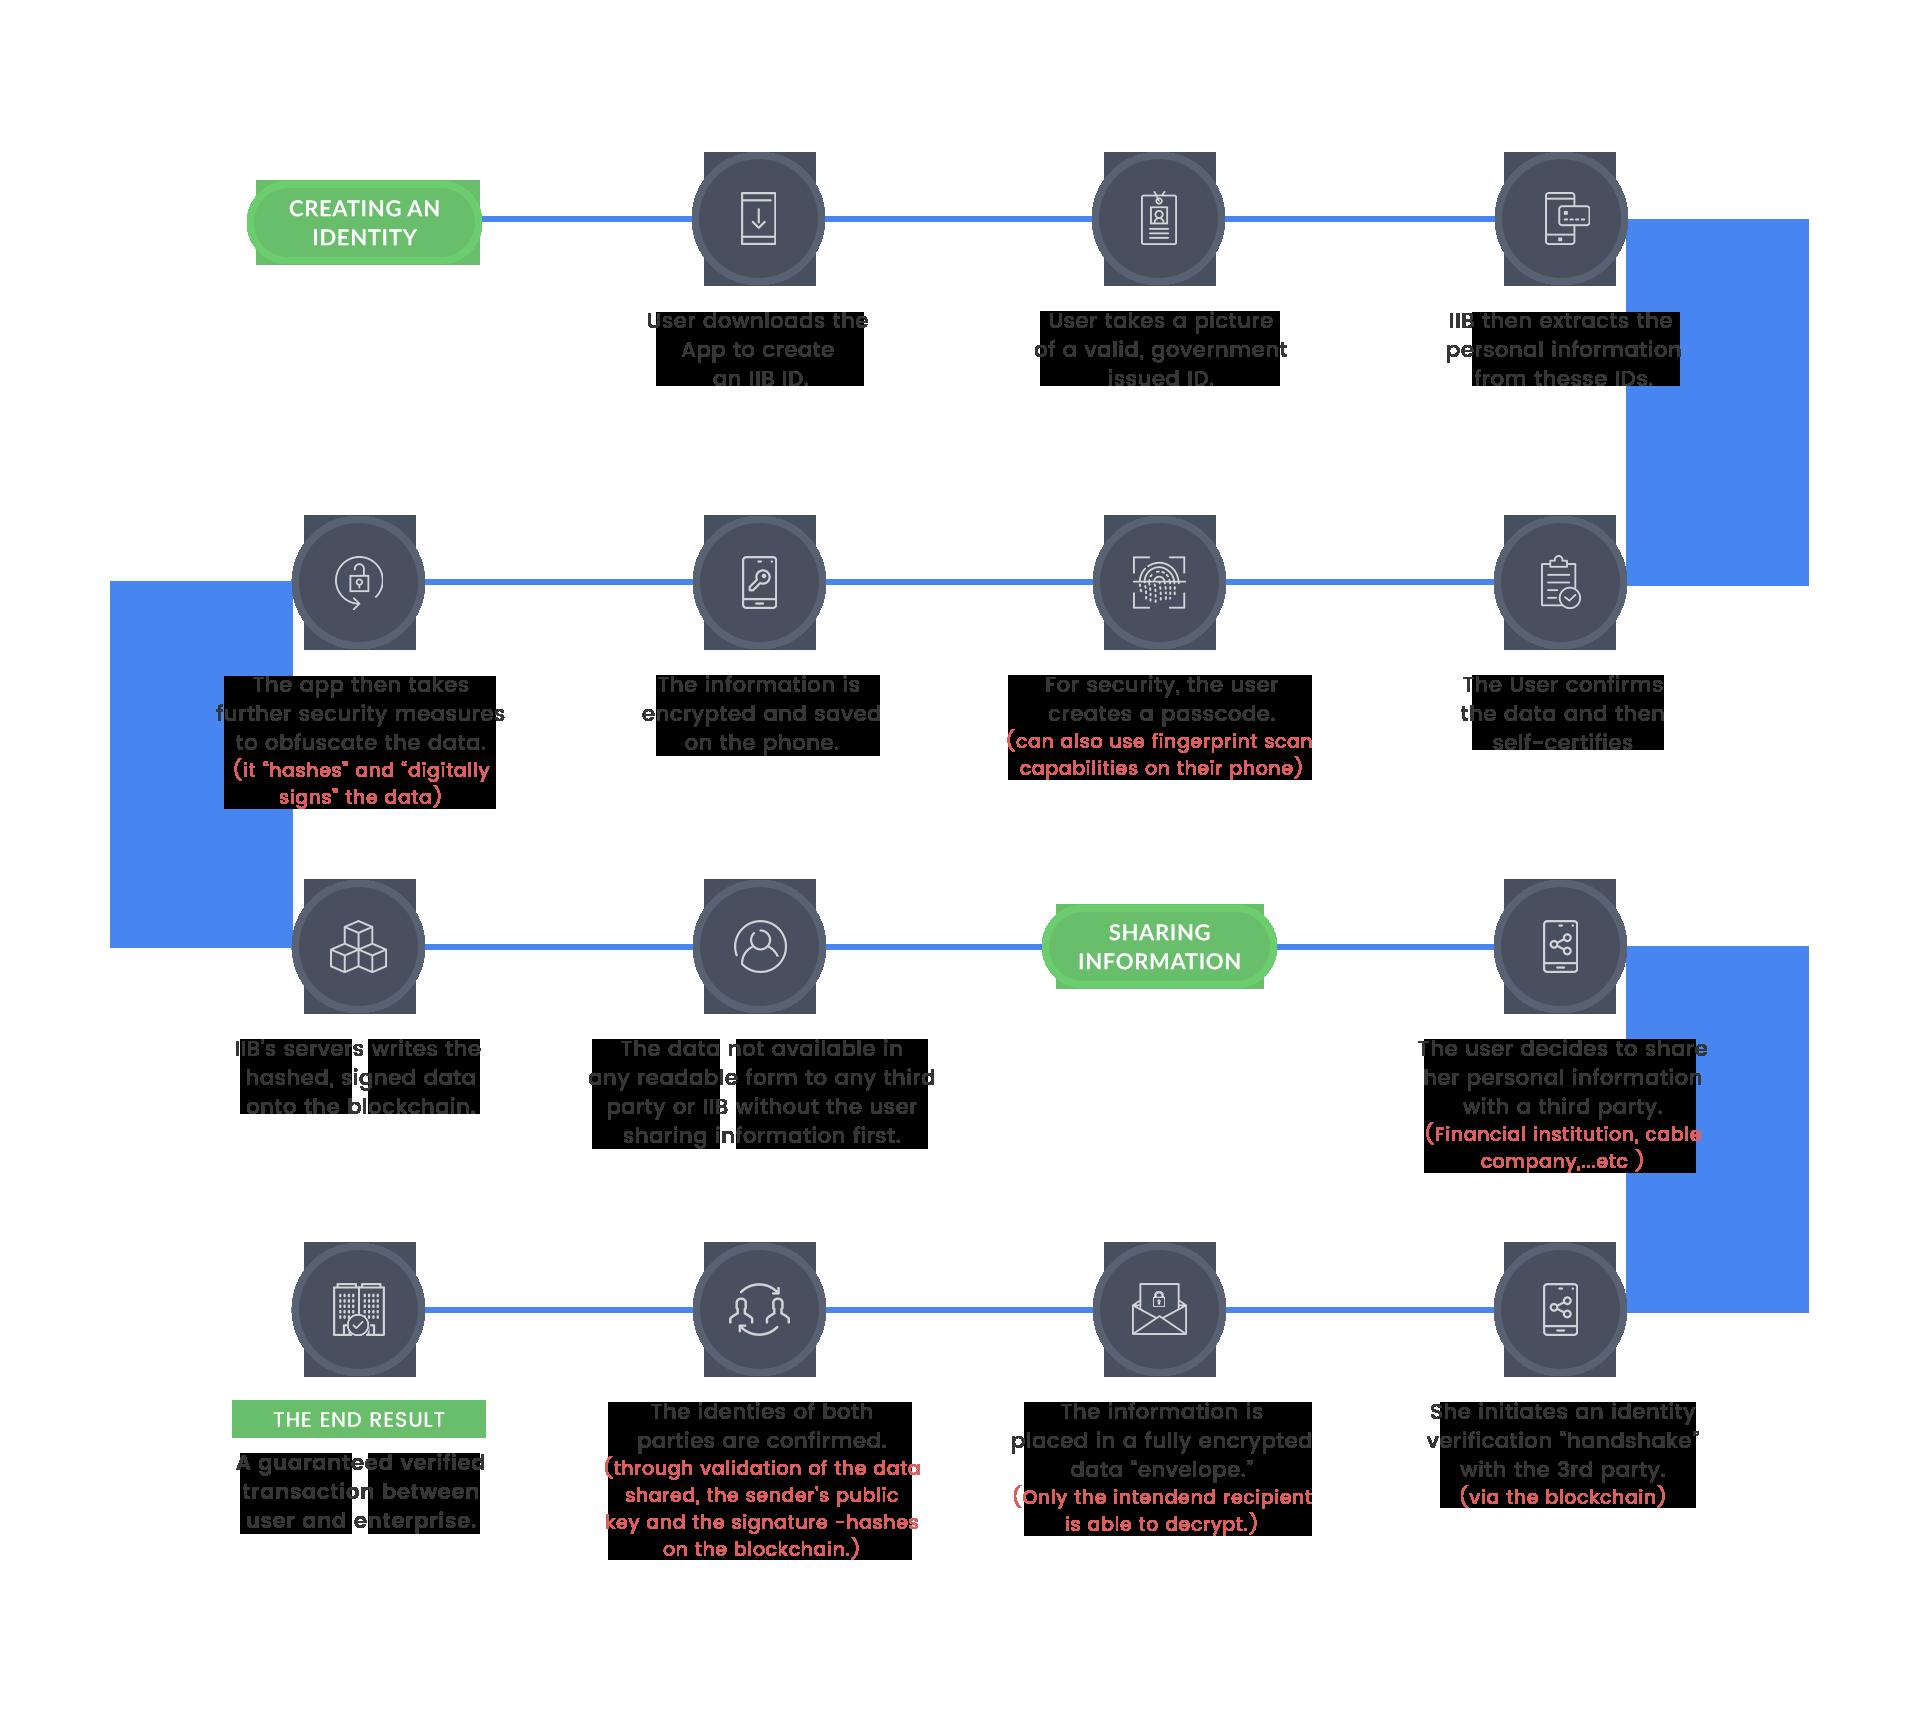 Blockchain for digital identity management systems